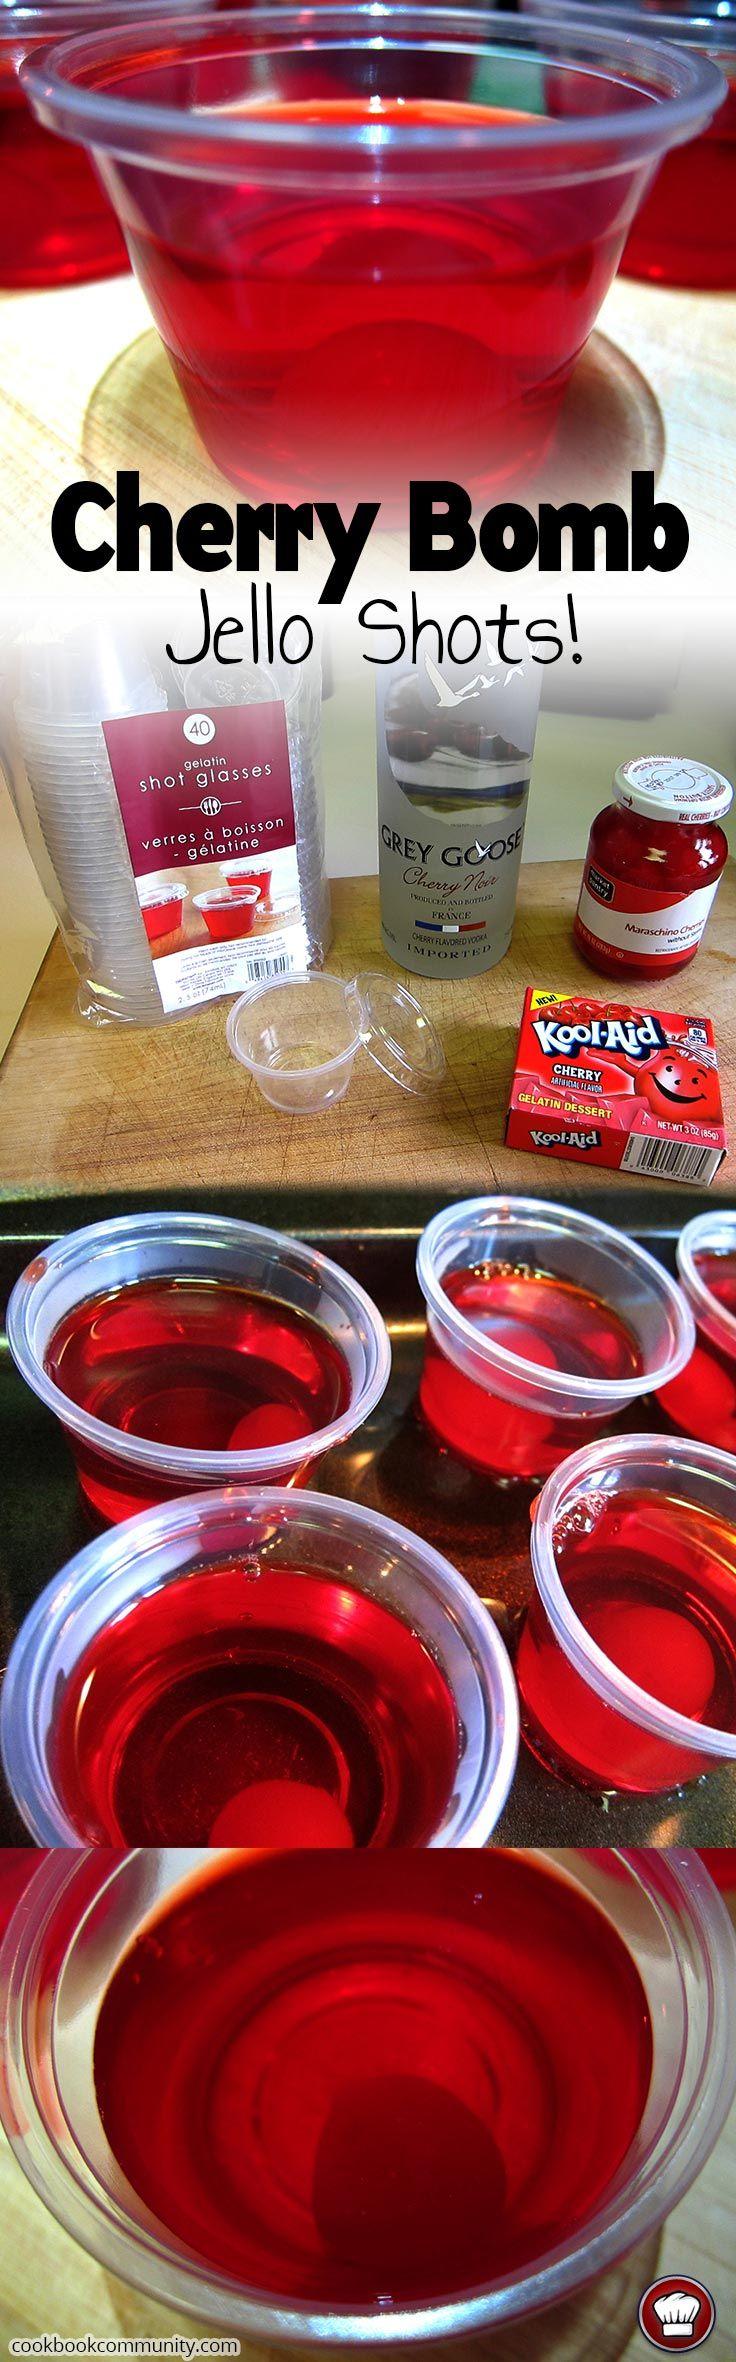 Cherry Bomb Jello Shots Recipe - GOT MAD LUV 4 FOOD, YO